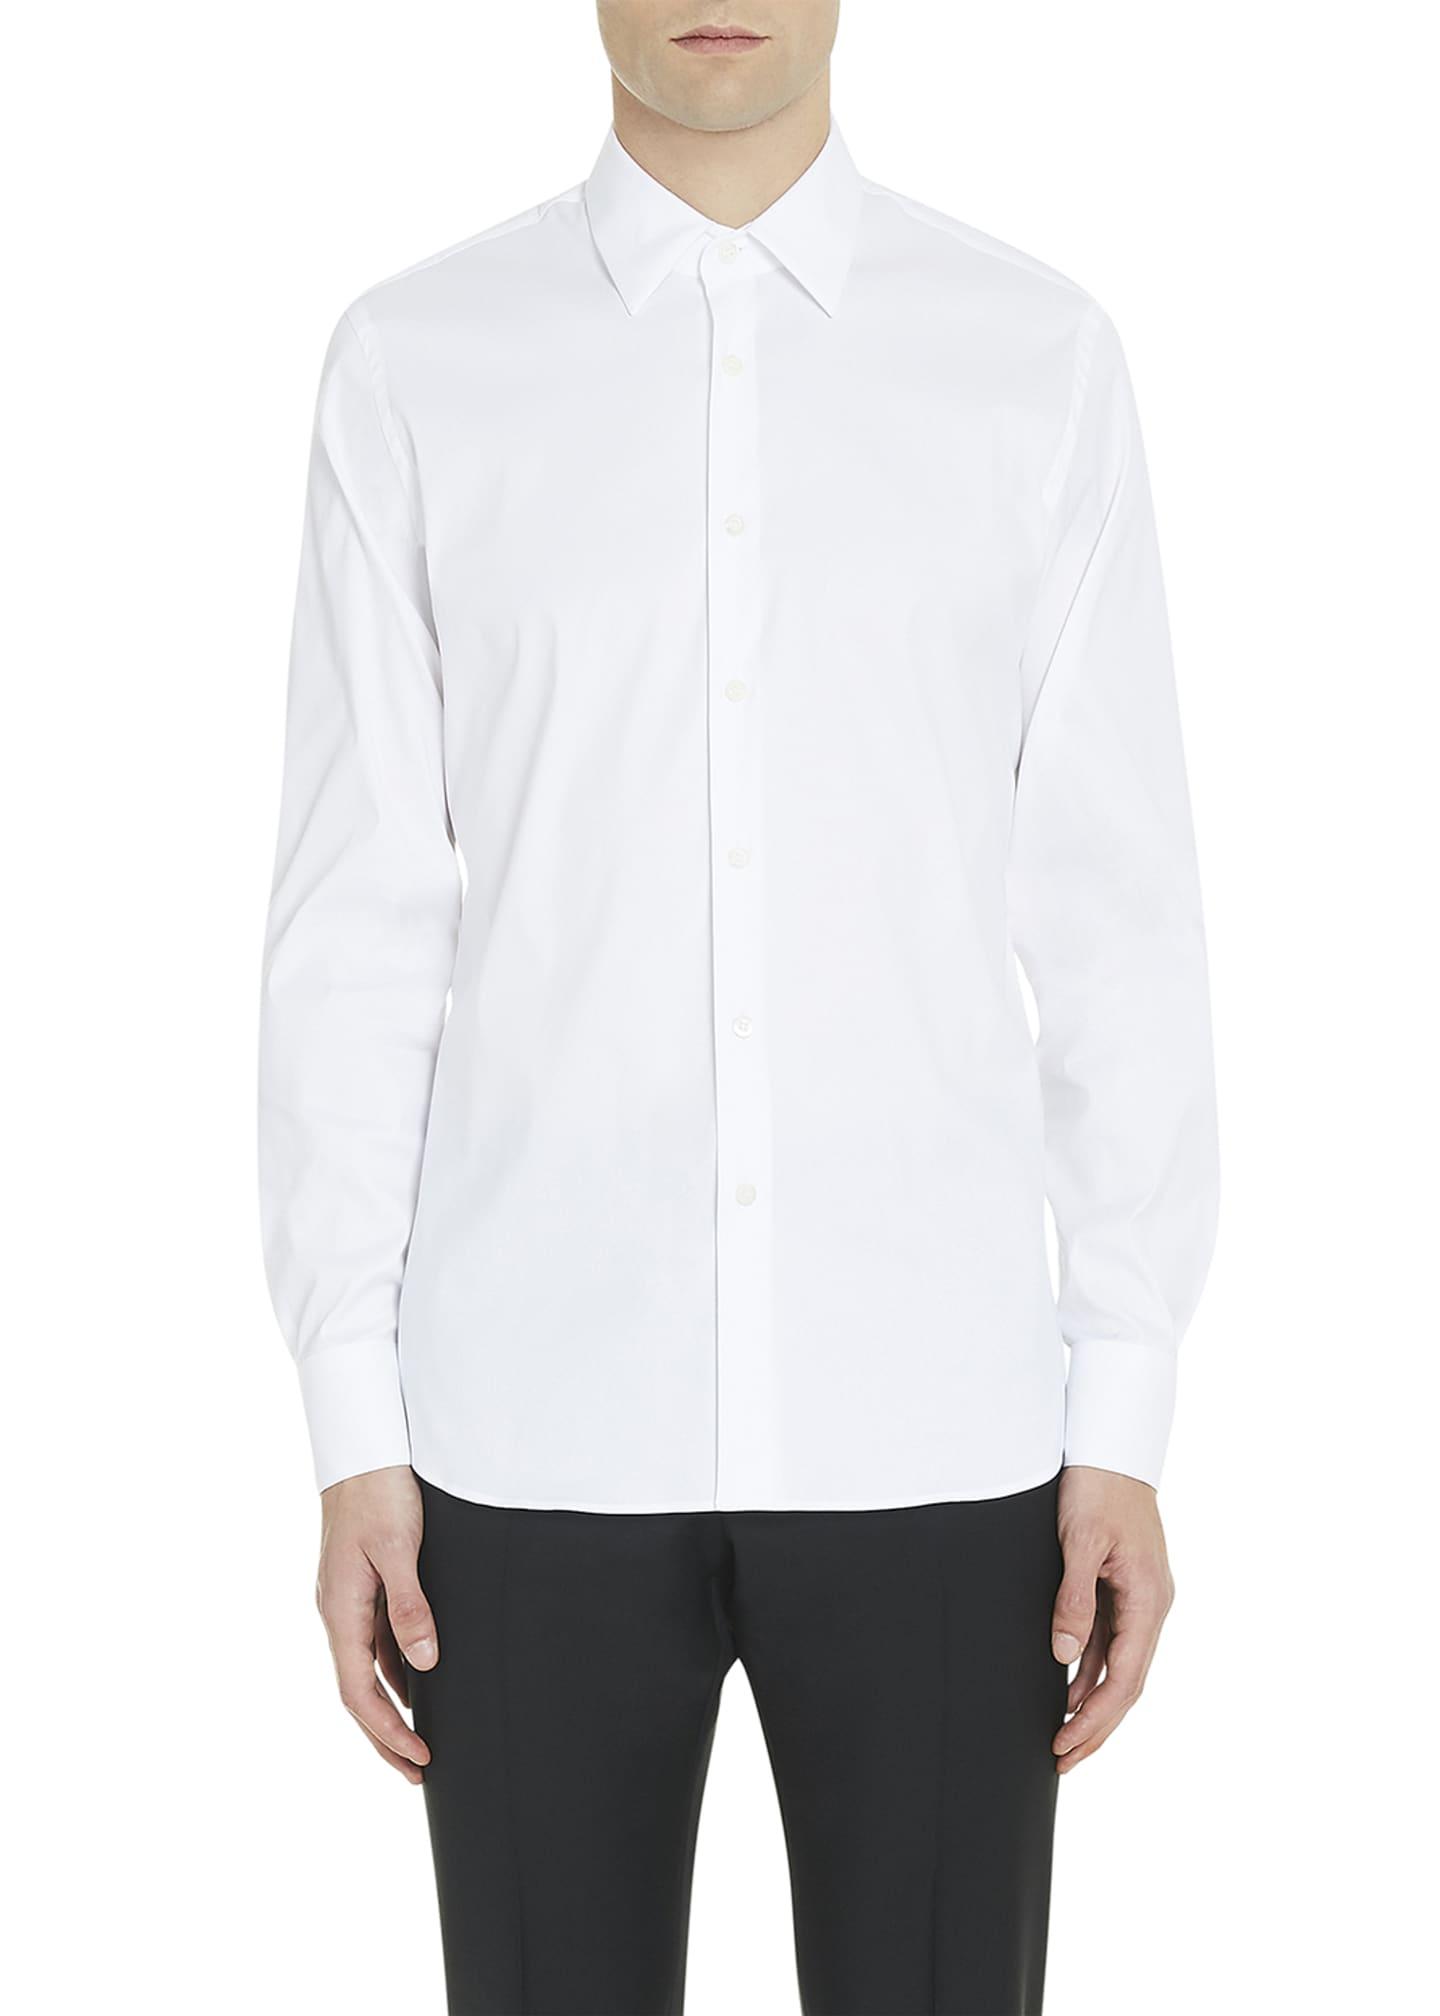 Prada Classic Cotton Poplin Slim-Fit Shirt